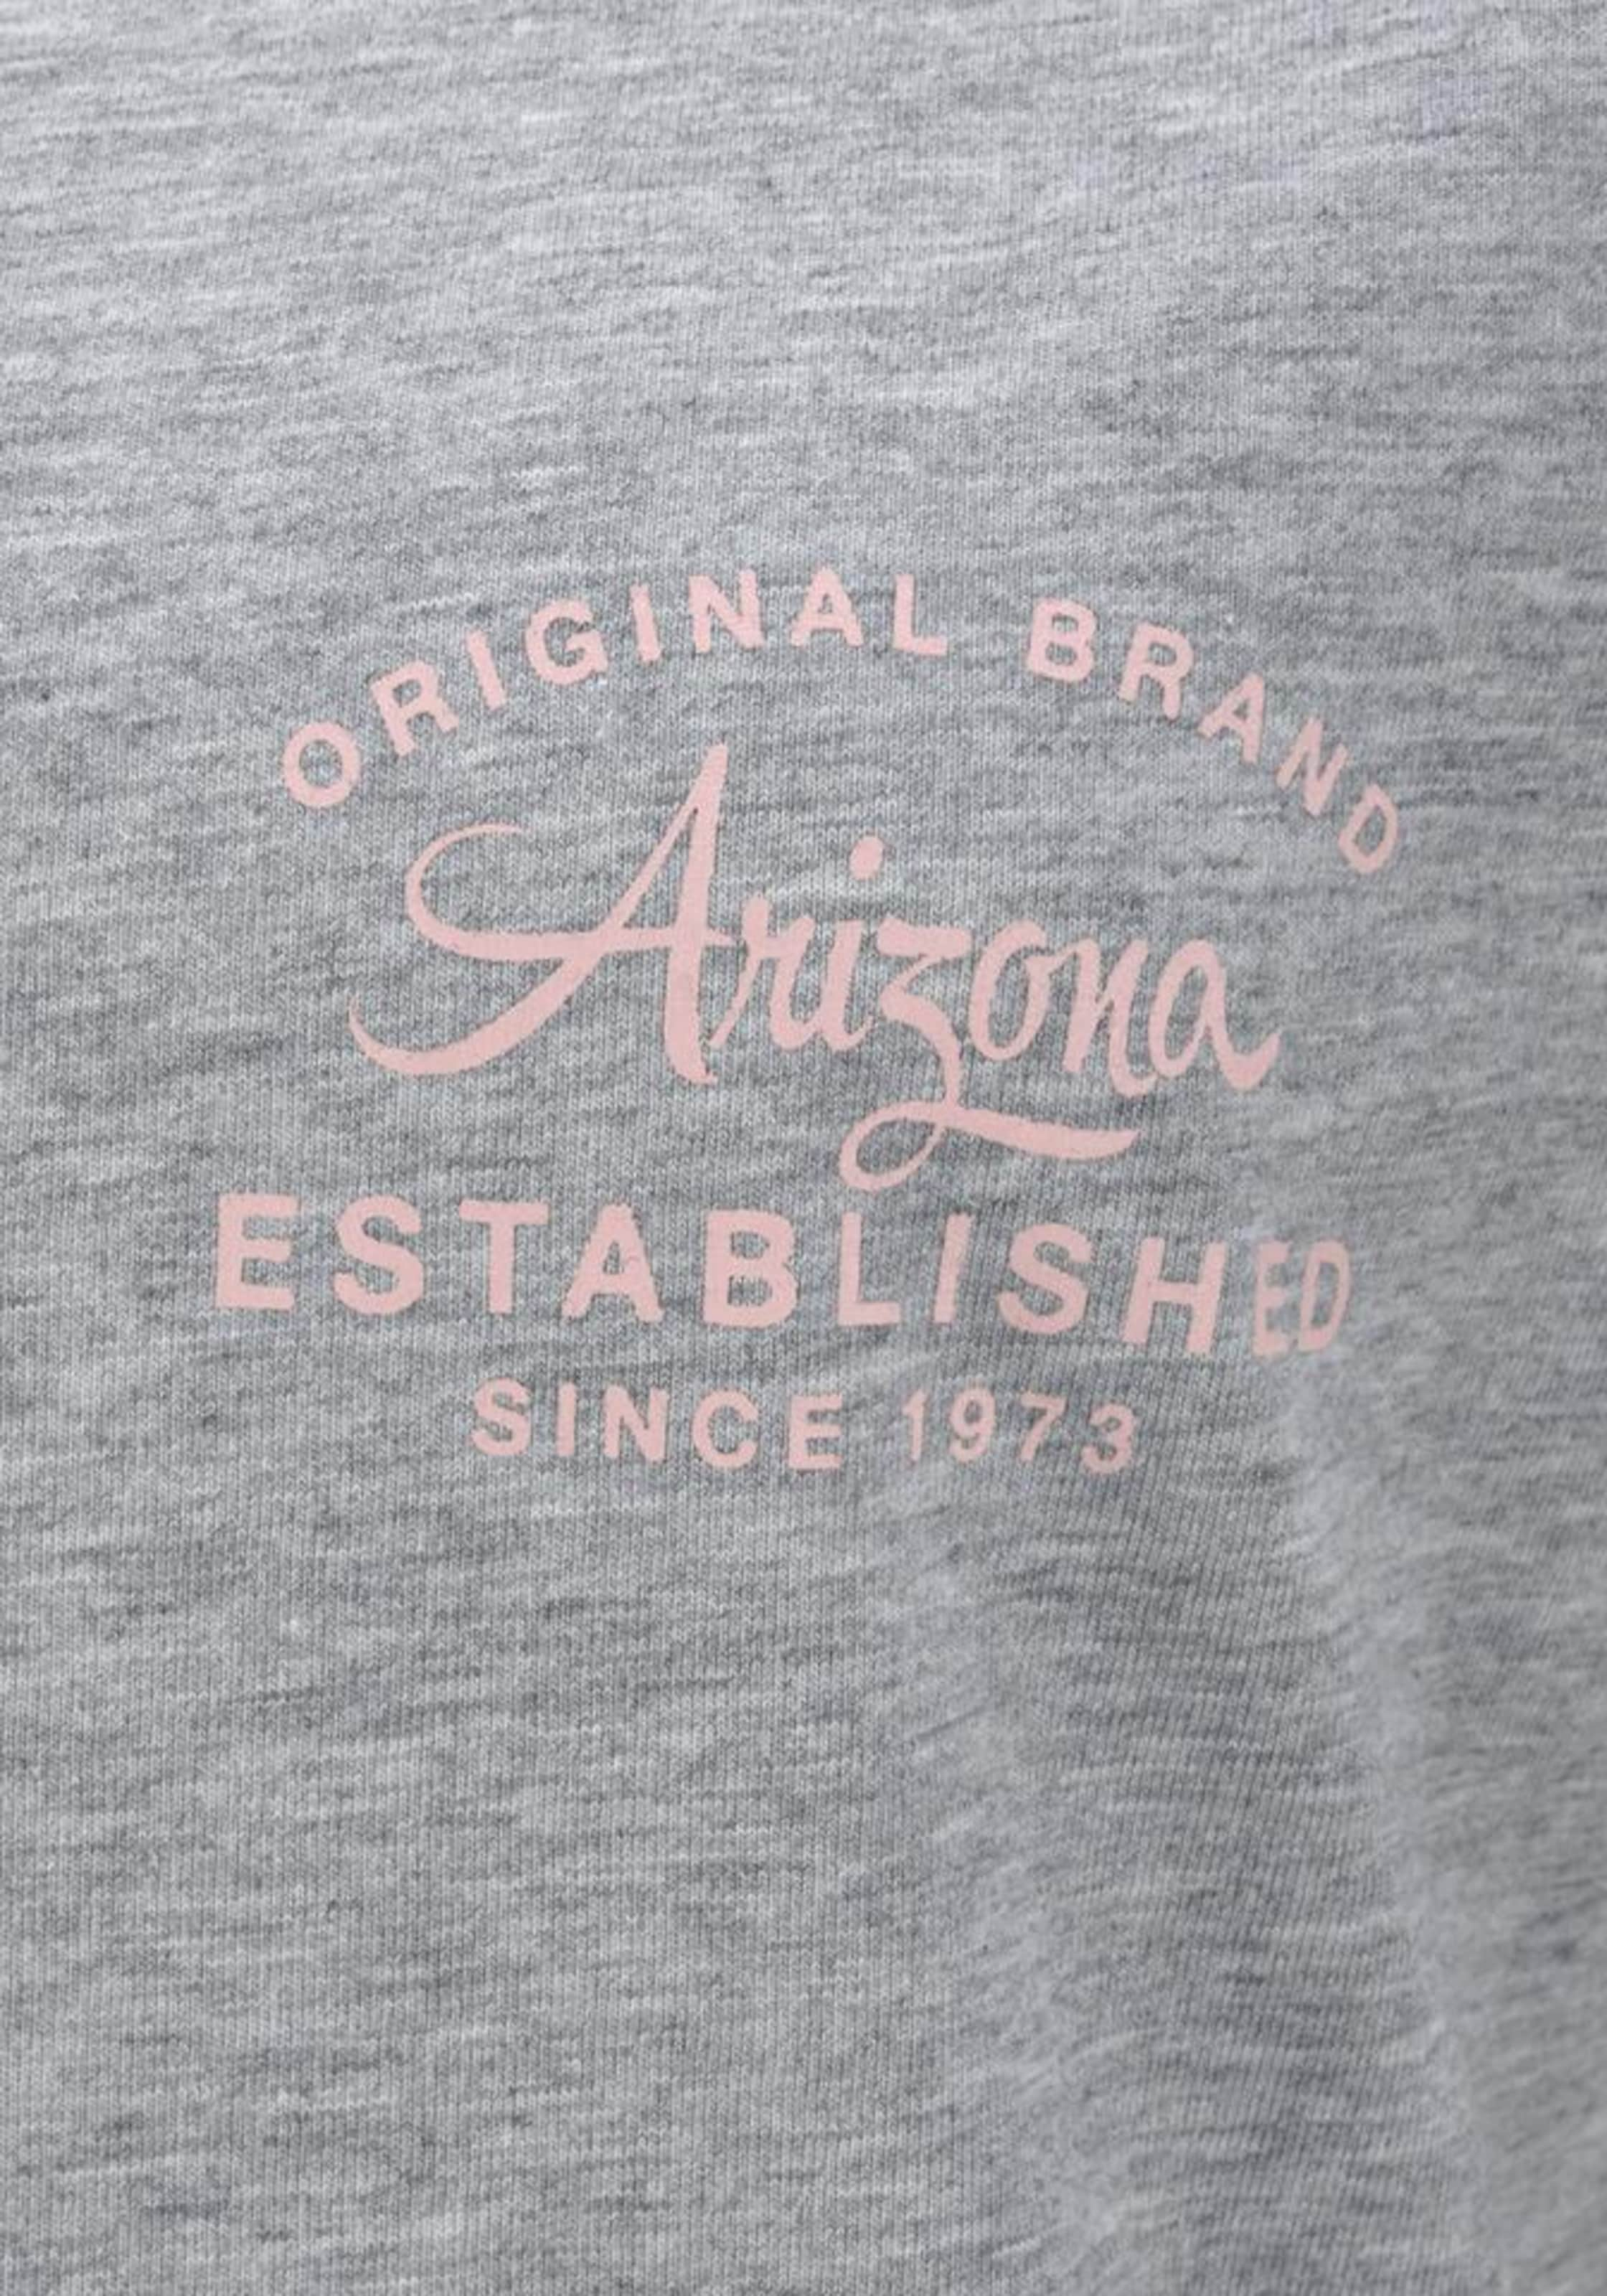 Arizona Shorty GraumeliertHellpink Arizona Shorty GraumeliertHellpink In Arizona In LUqVjSzMpG